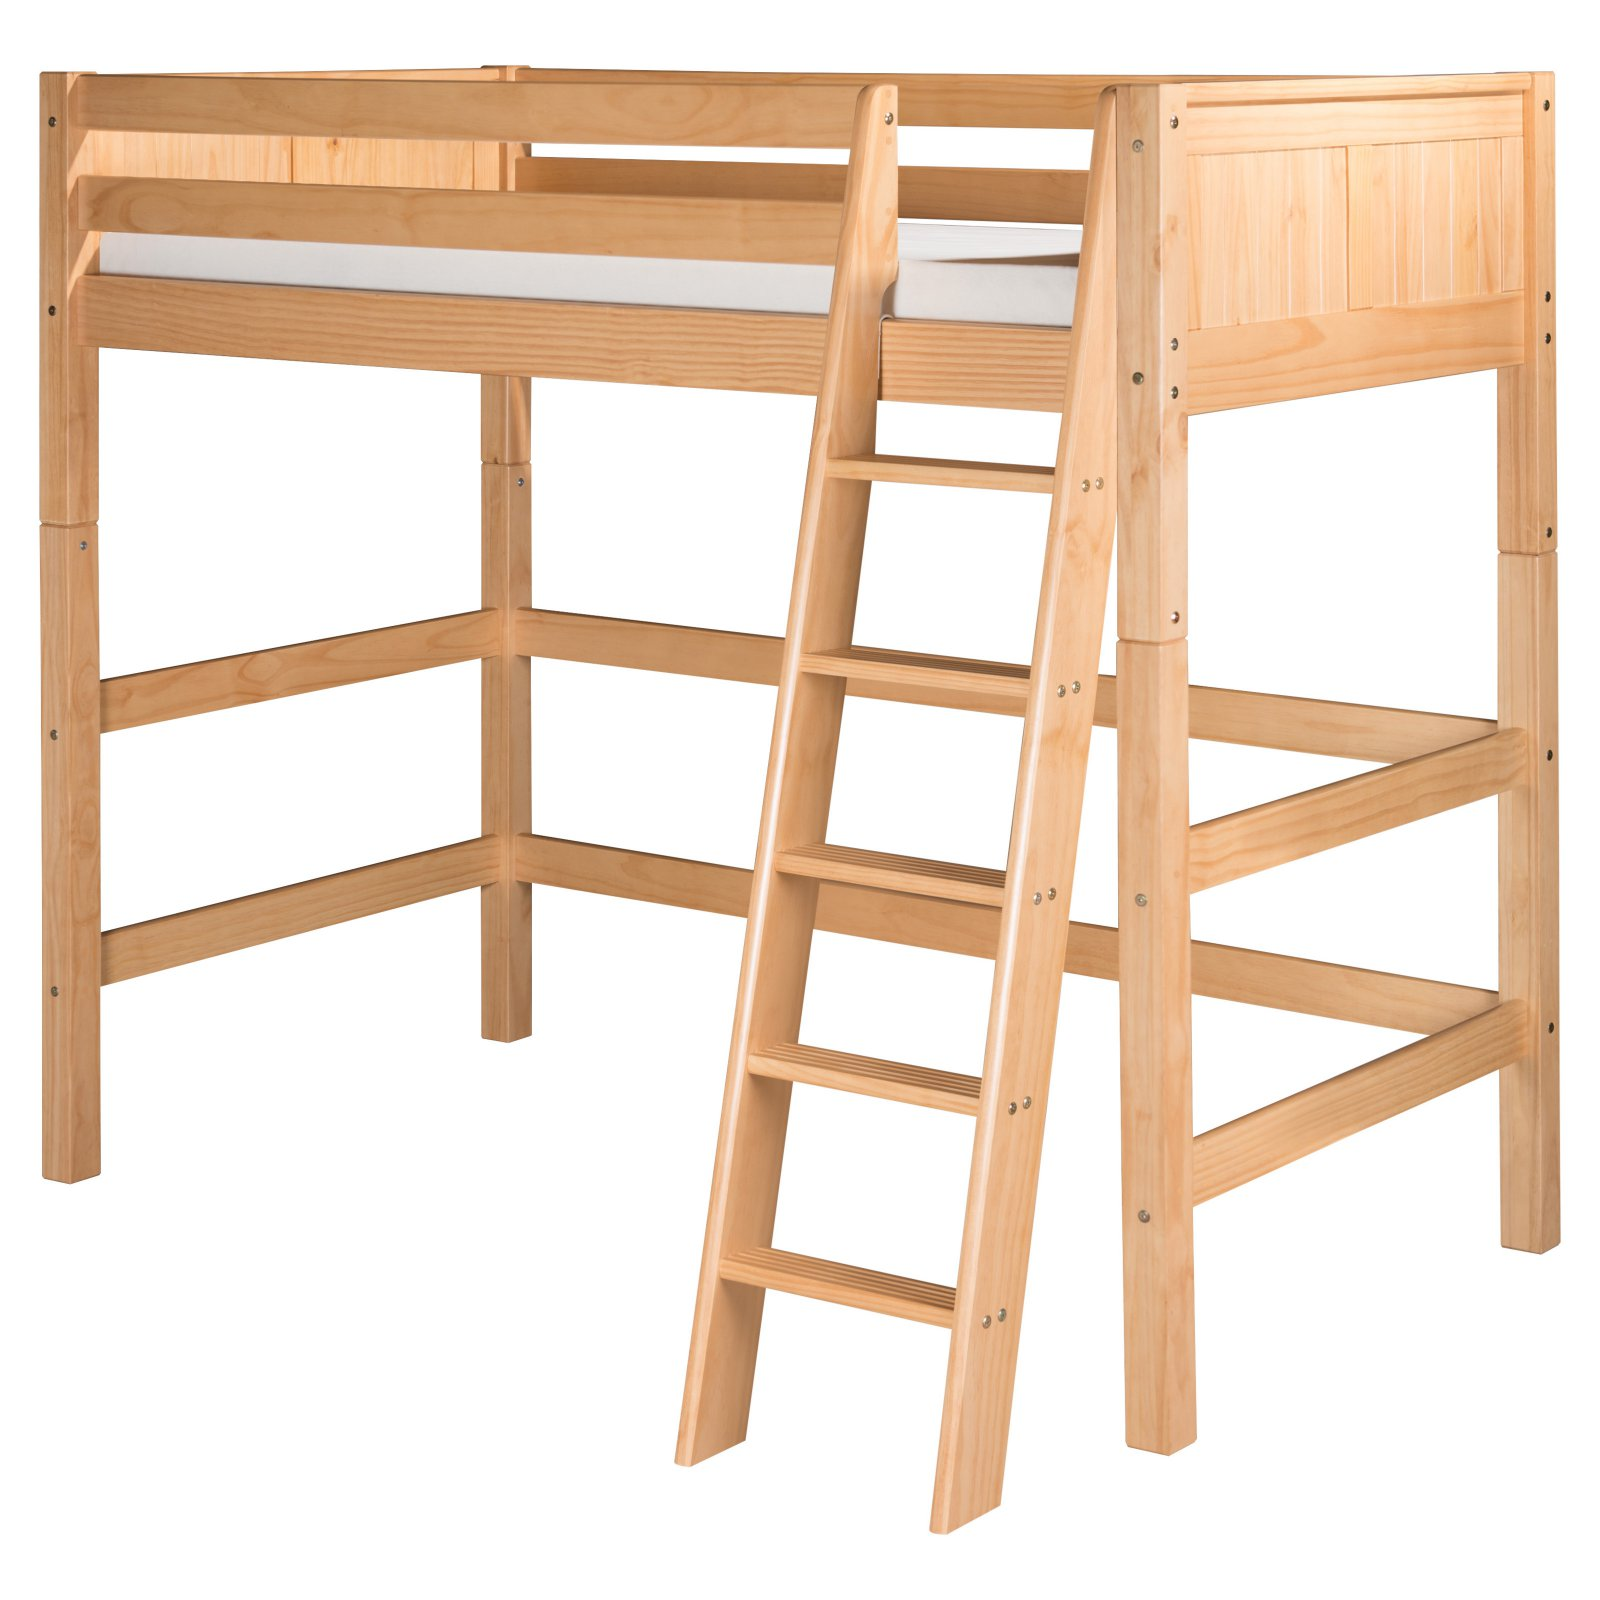 Camaflexi Full Size High Loft Bed - Panel Headboard - Natural Finish